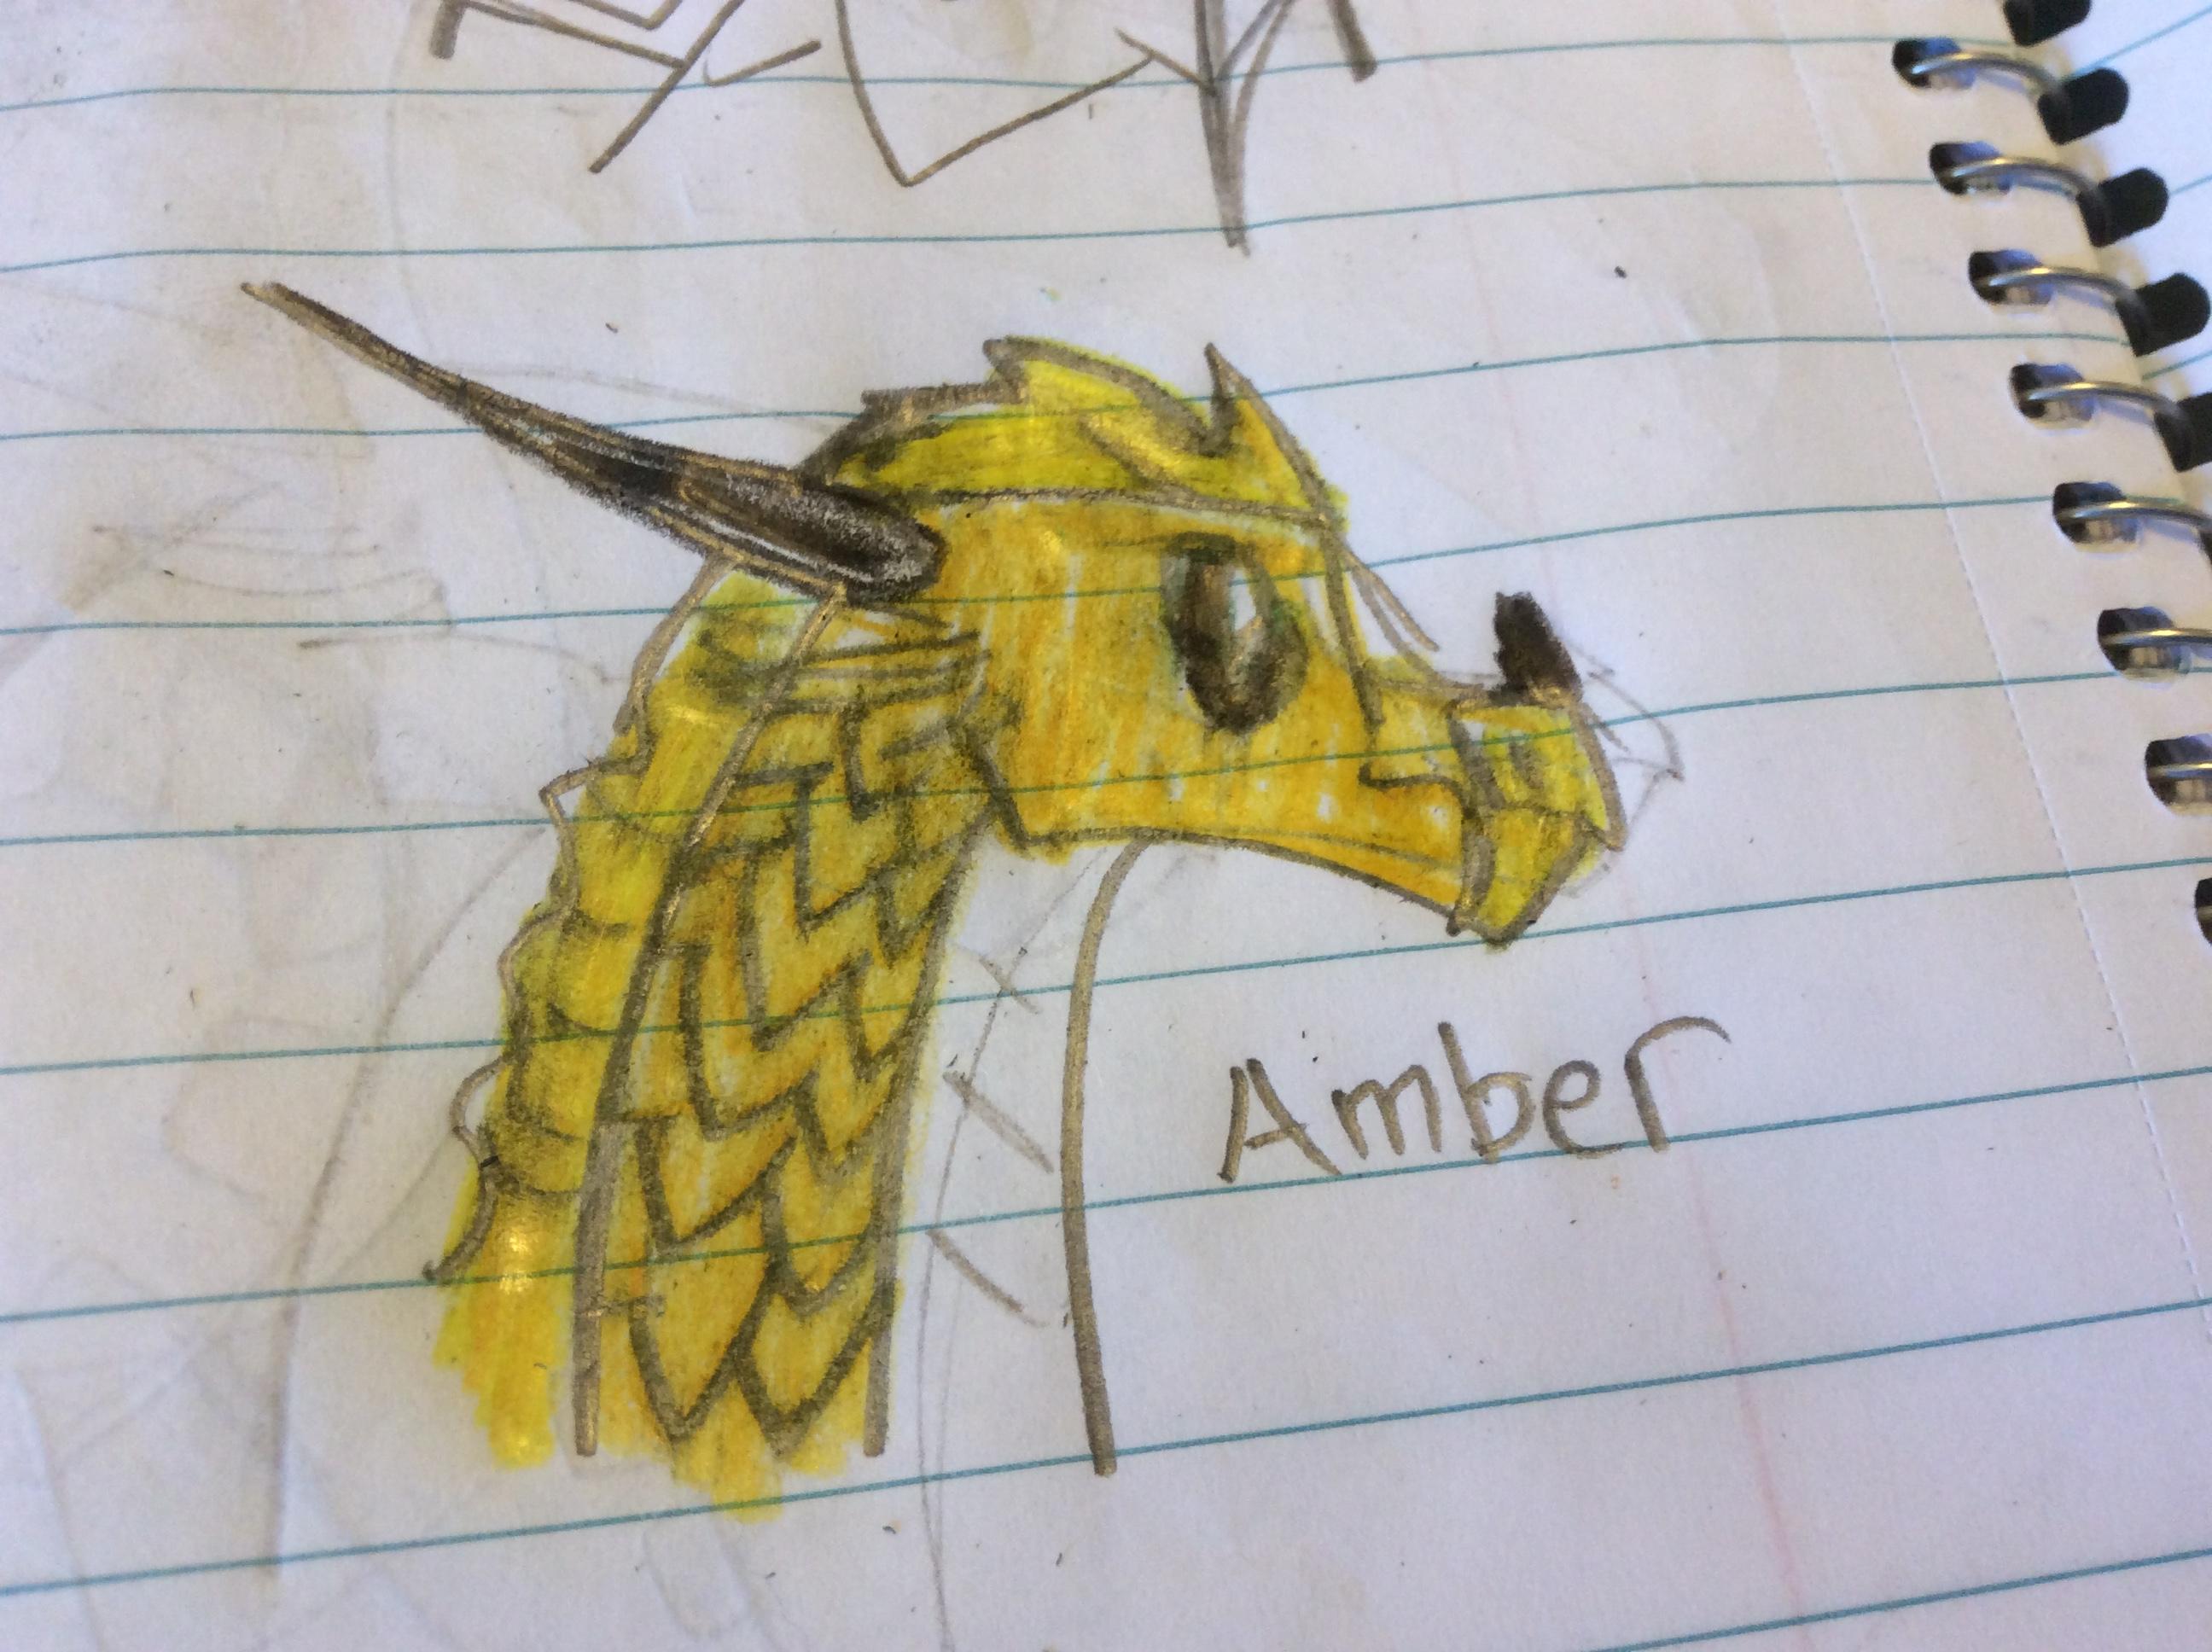 Amber the Sandwing